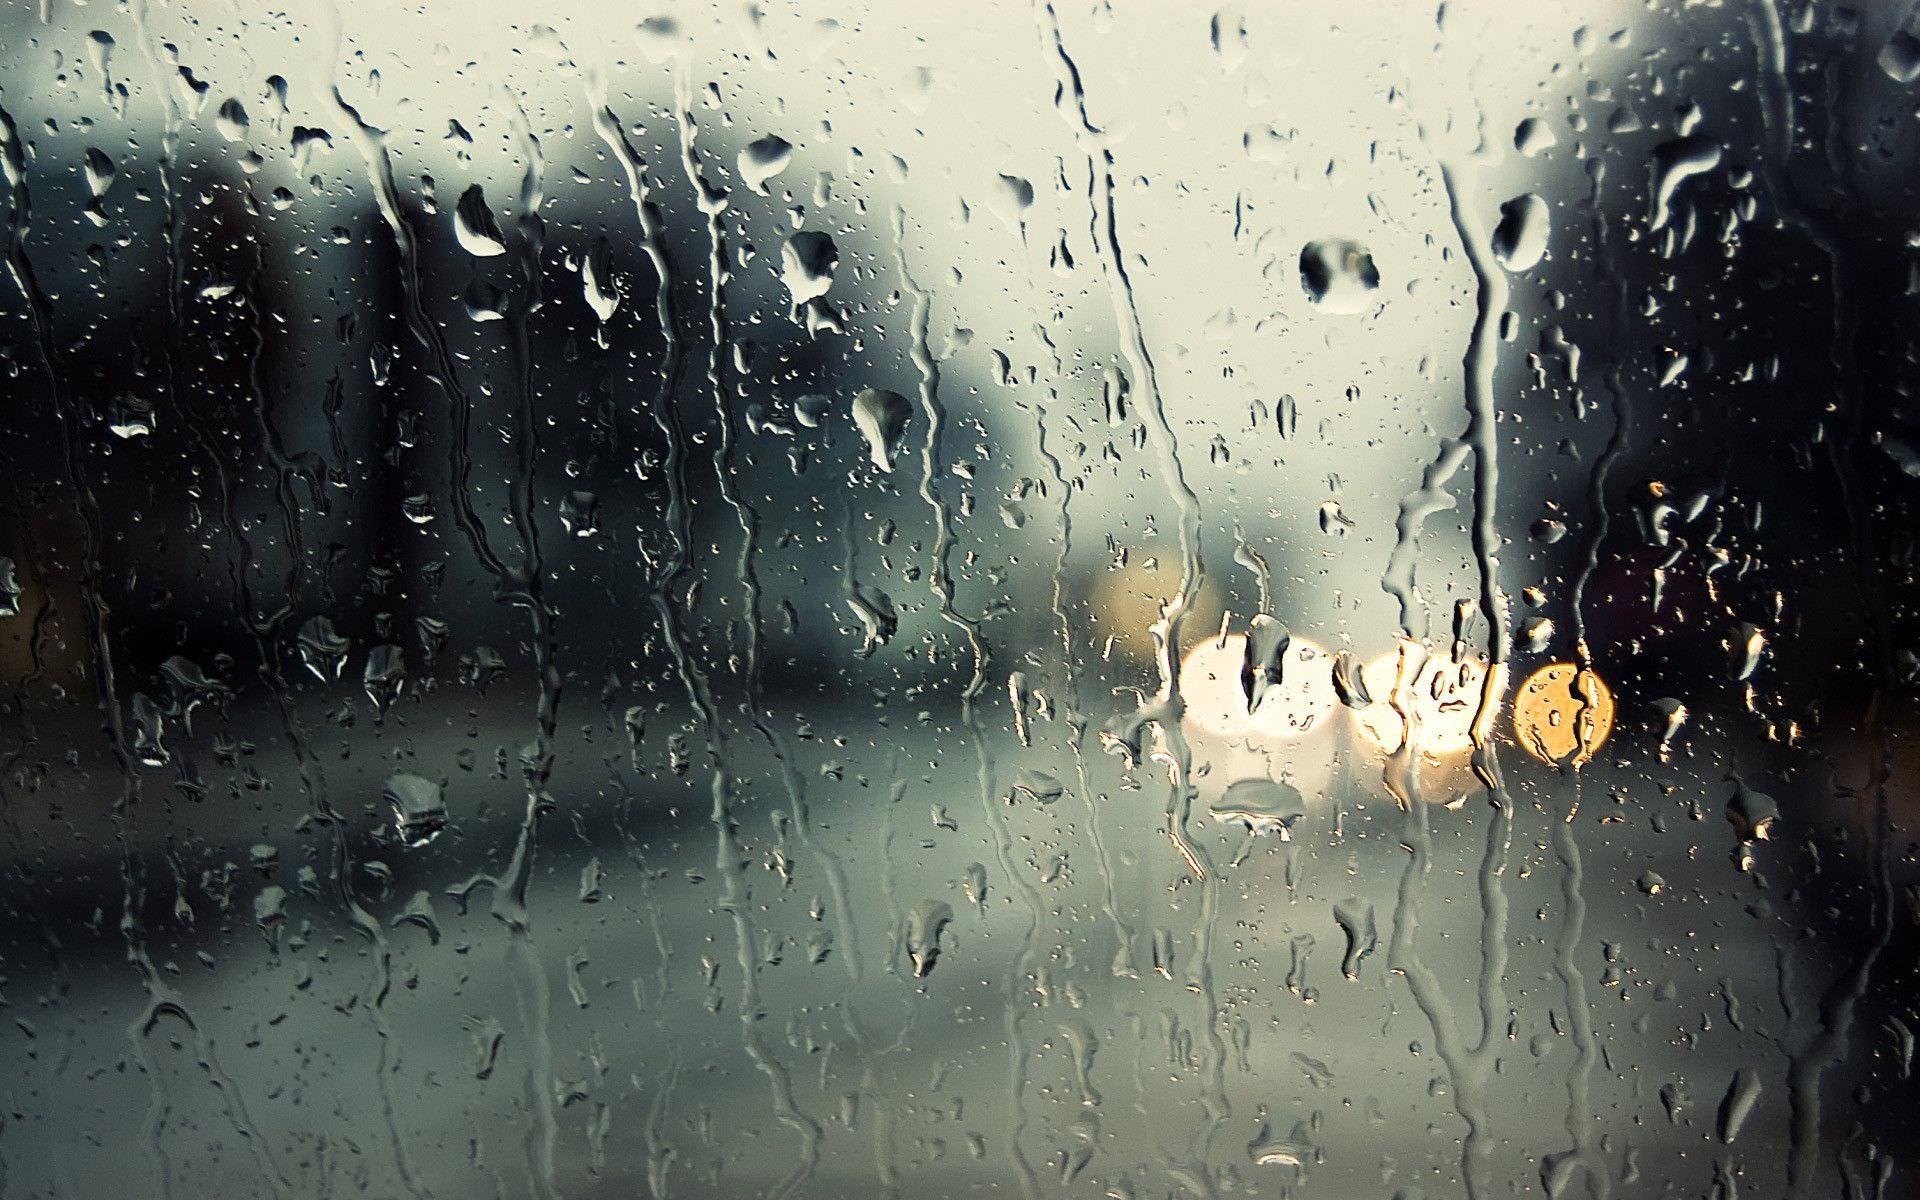 Raining Wallpaper 68 Pictures